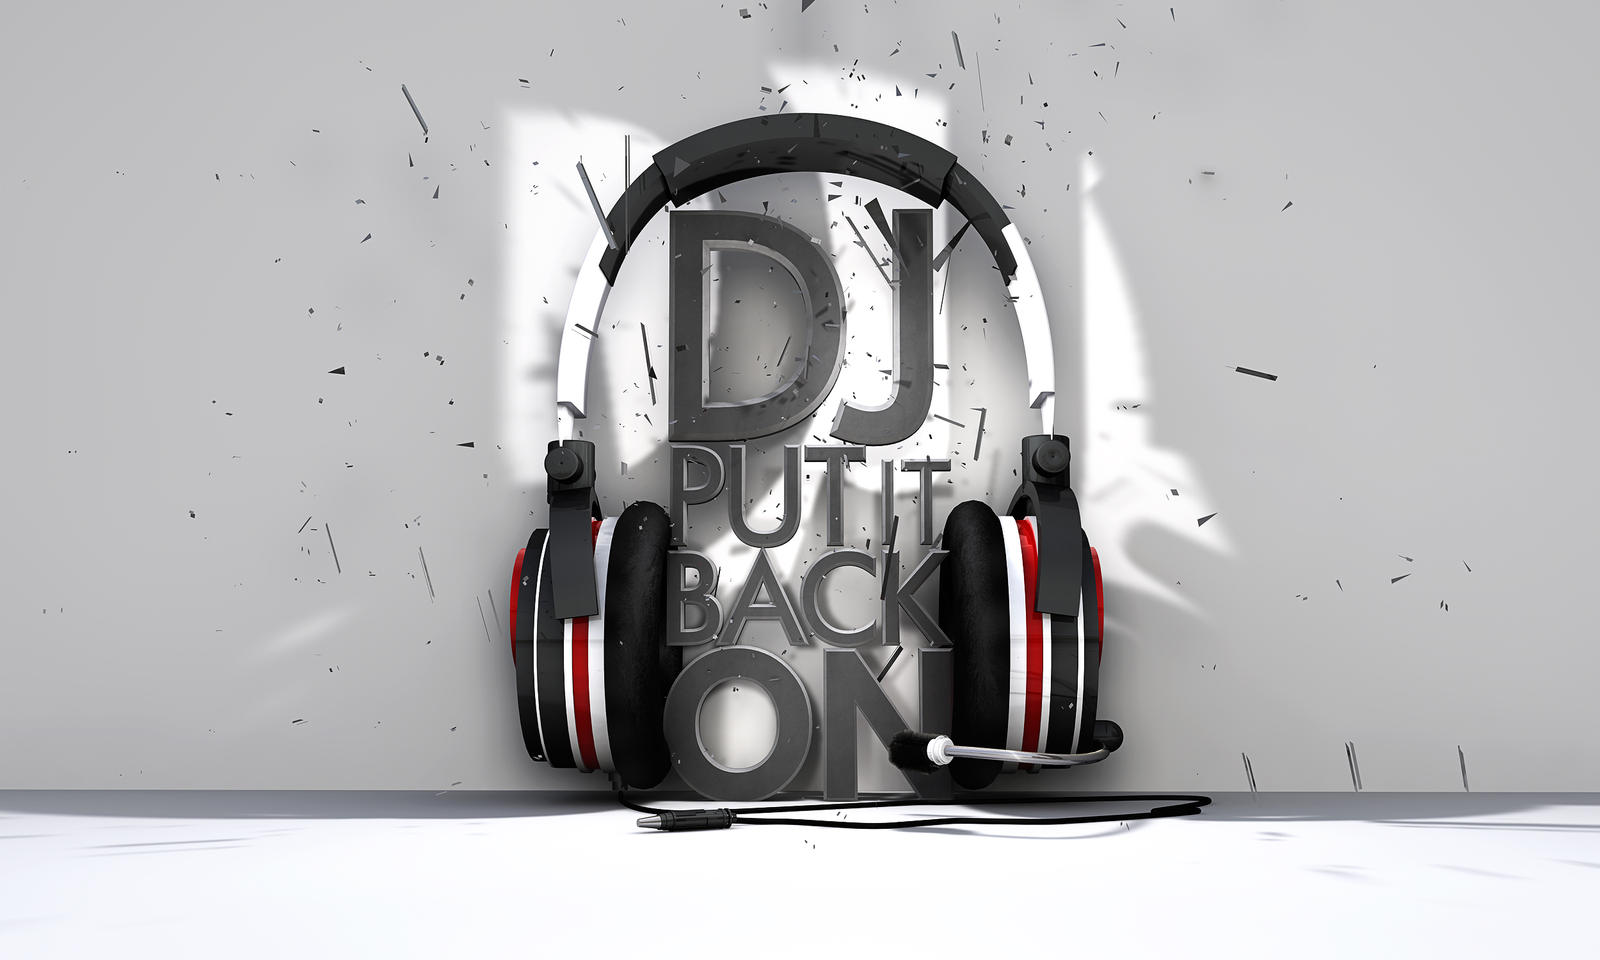 DJ PUT IT BACK ON by UberzErO